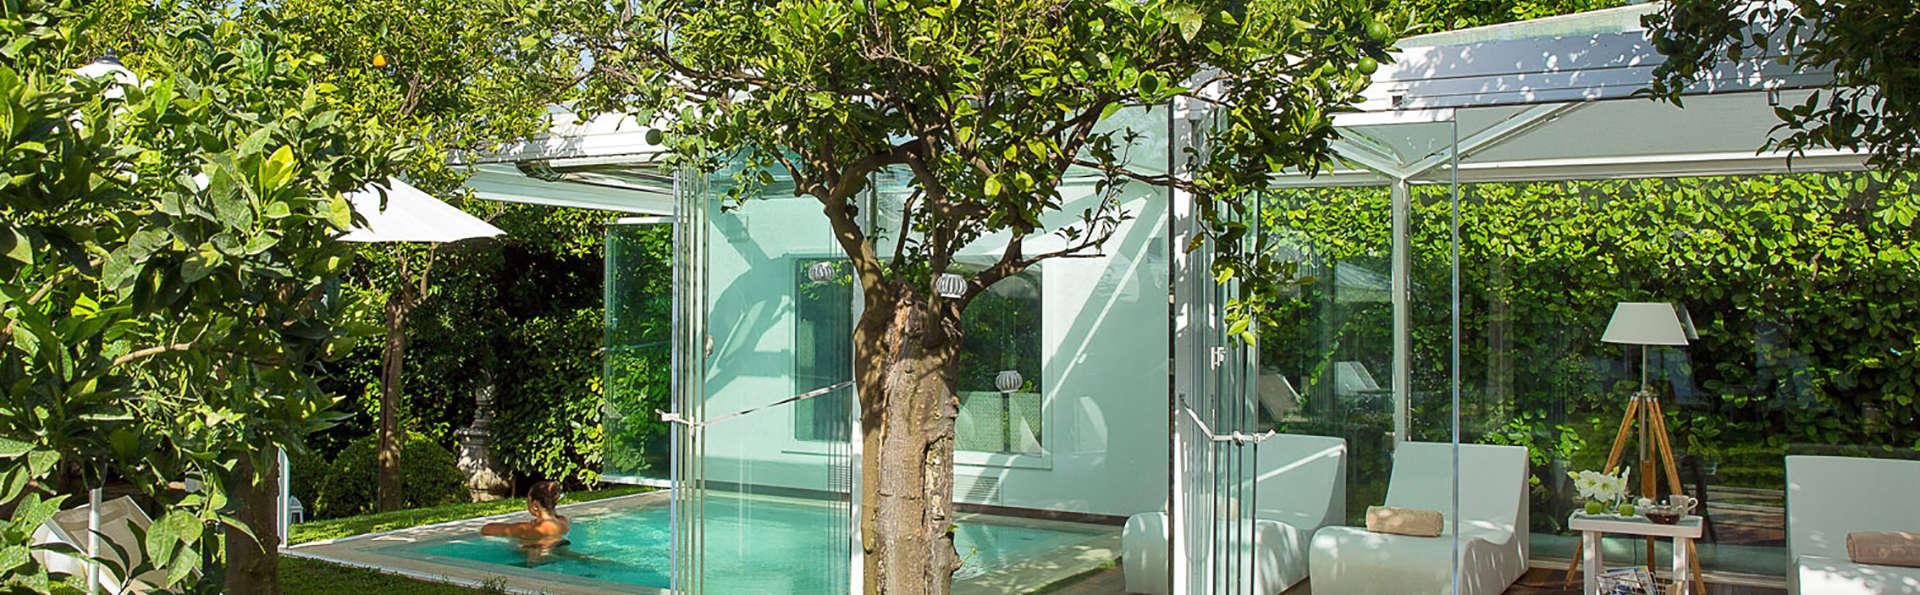 La Medusa Hotel & Boutique Spa - edit_garden-terras_pool2.jpg